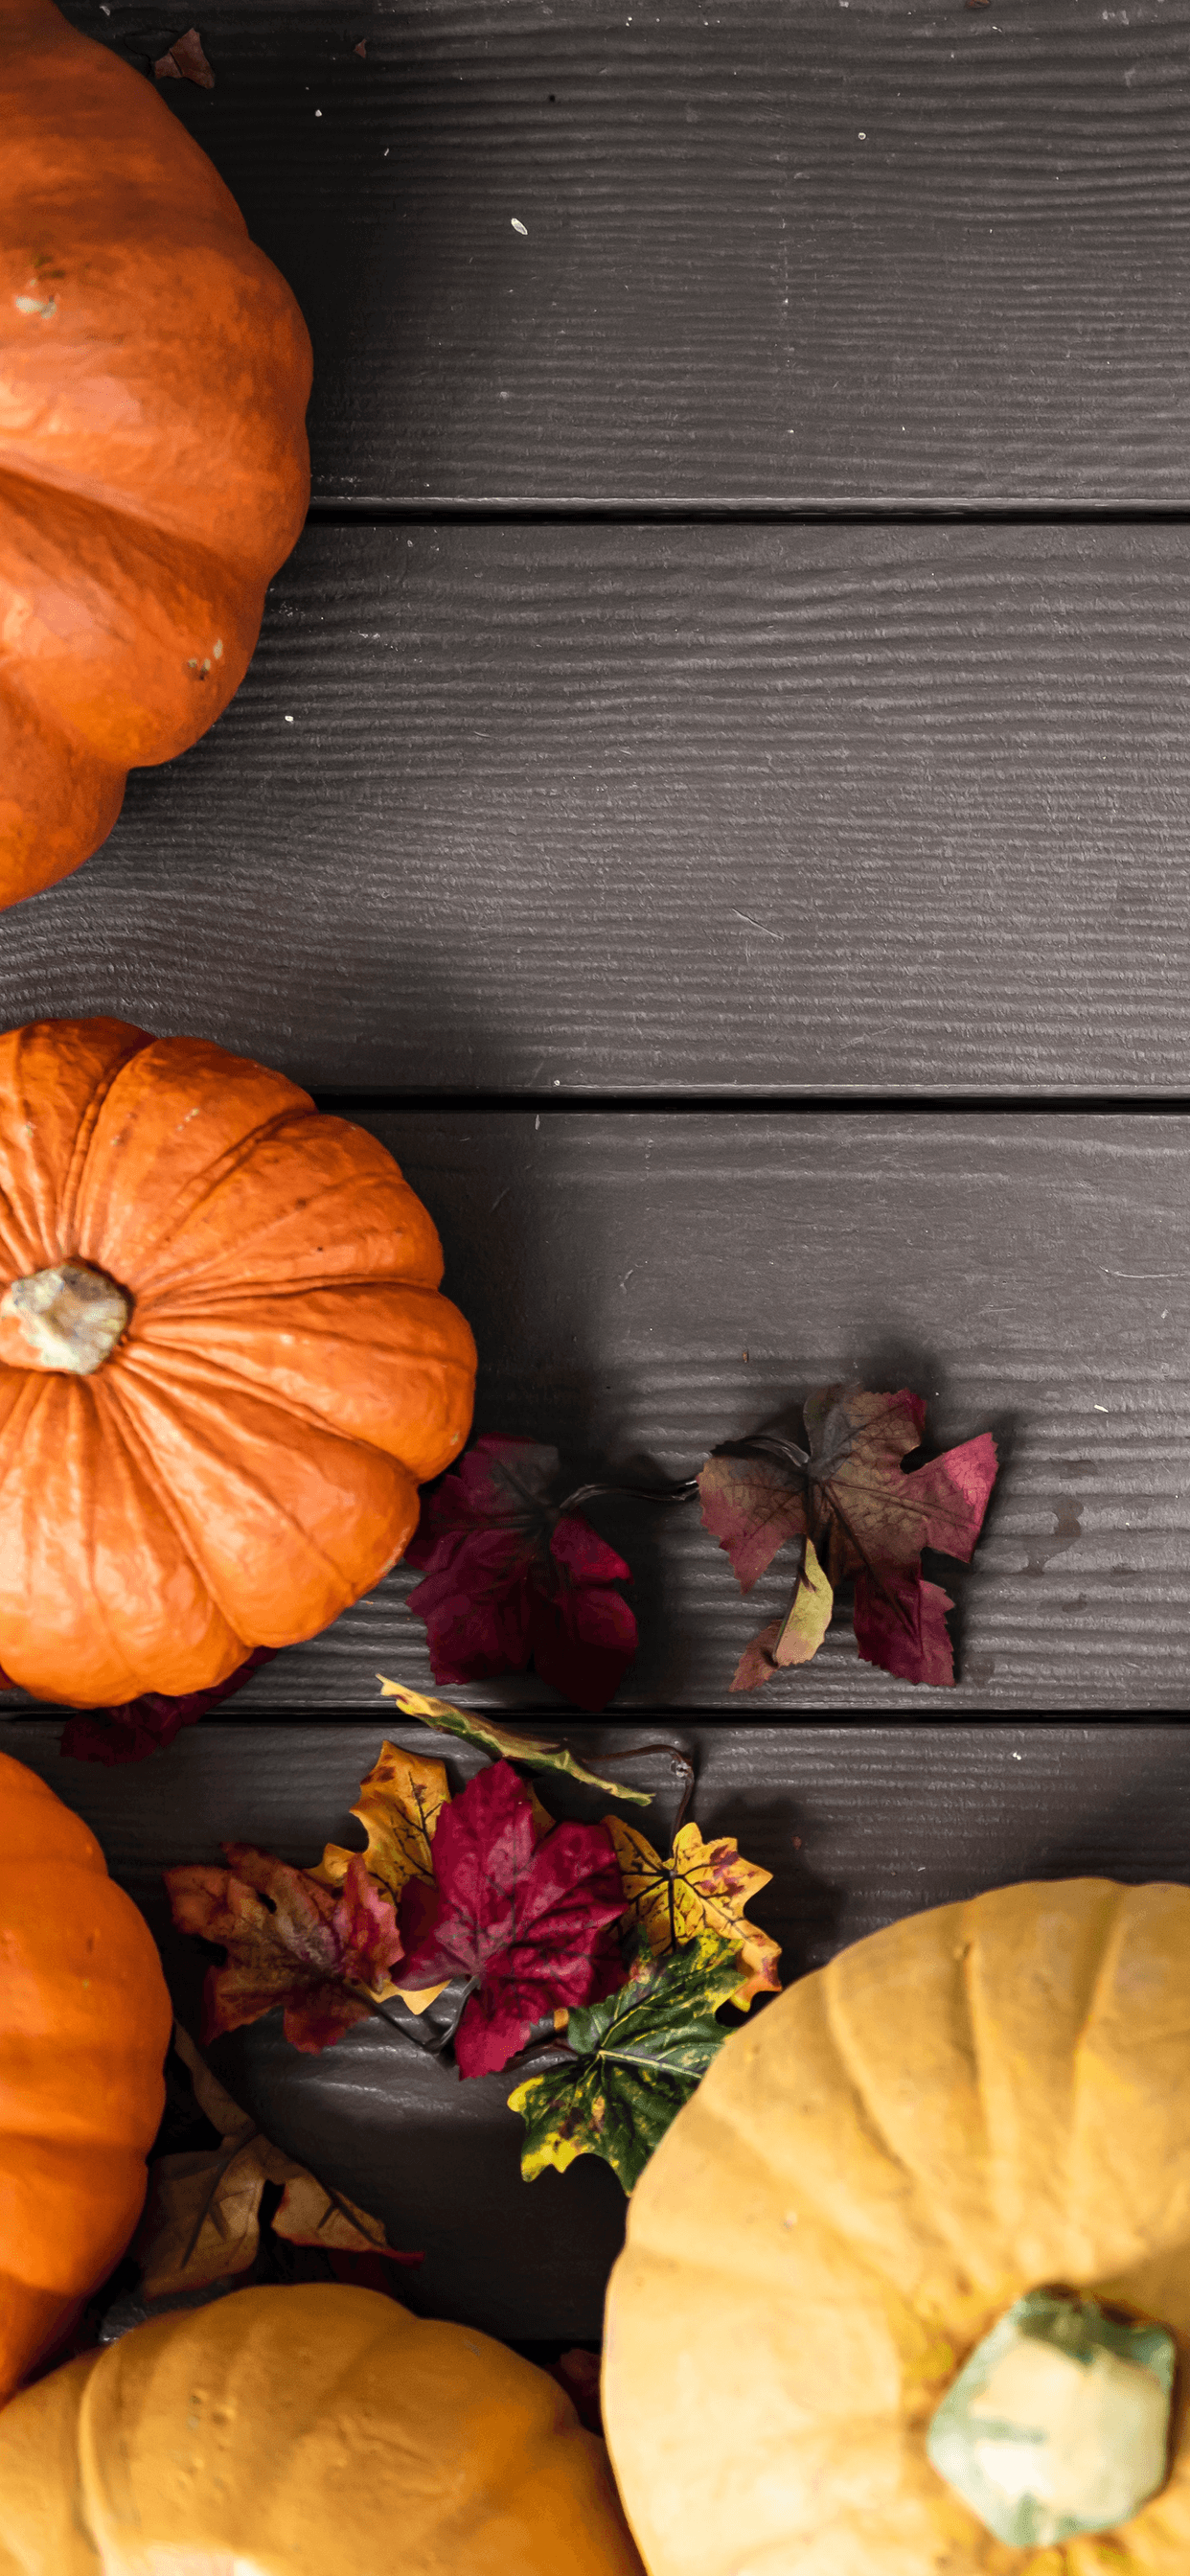 Pumpkin Phone Wallpaper Posted By Christopher Walker